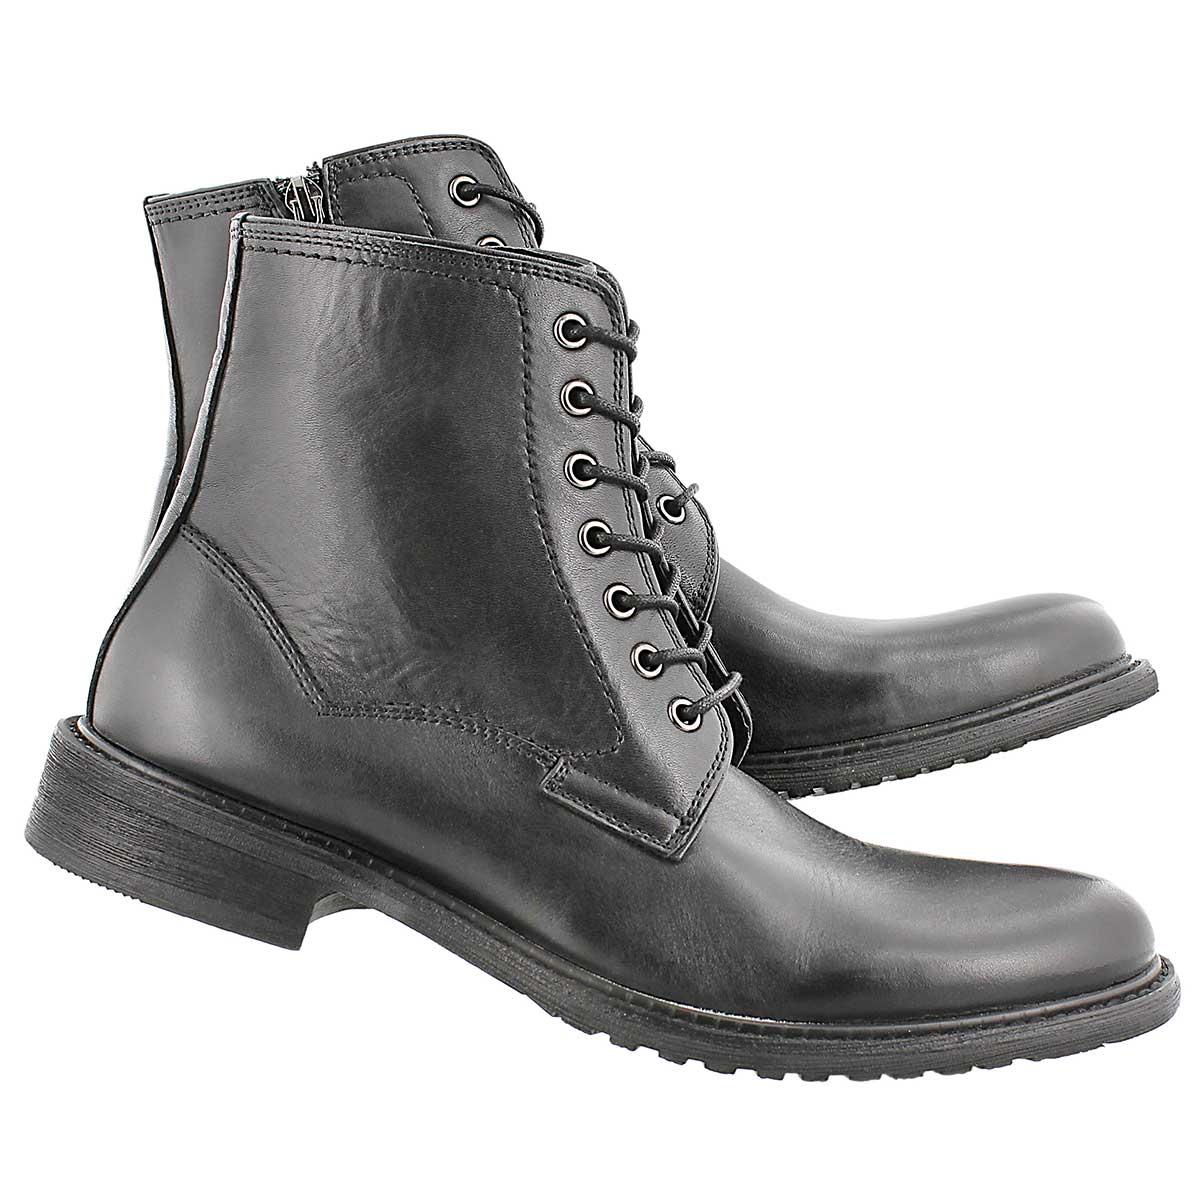 Mns Mountie blk 7eye oil lthr lace boot